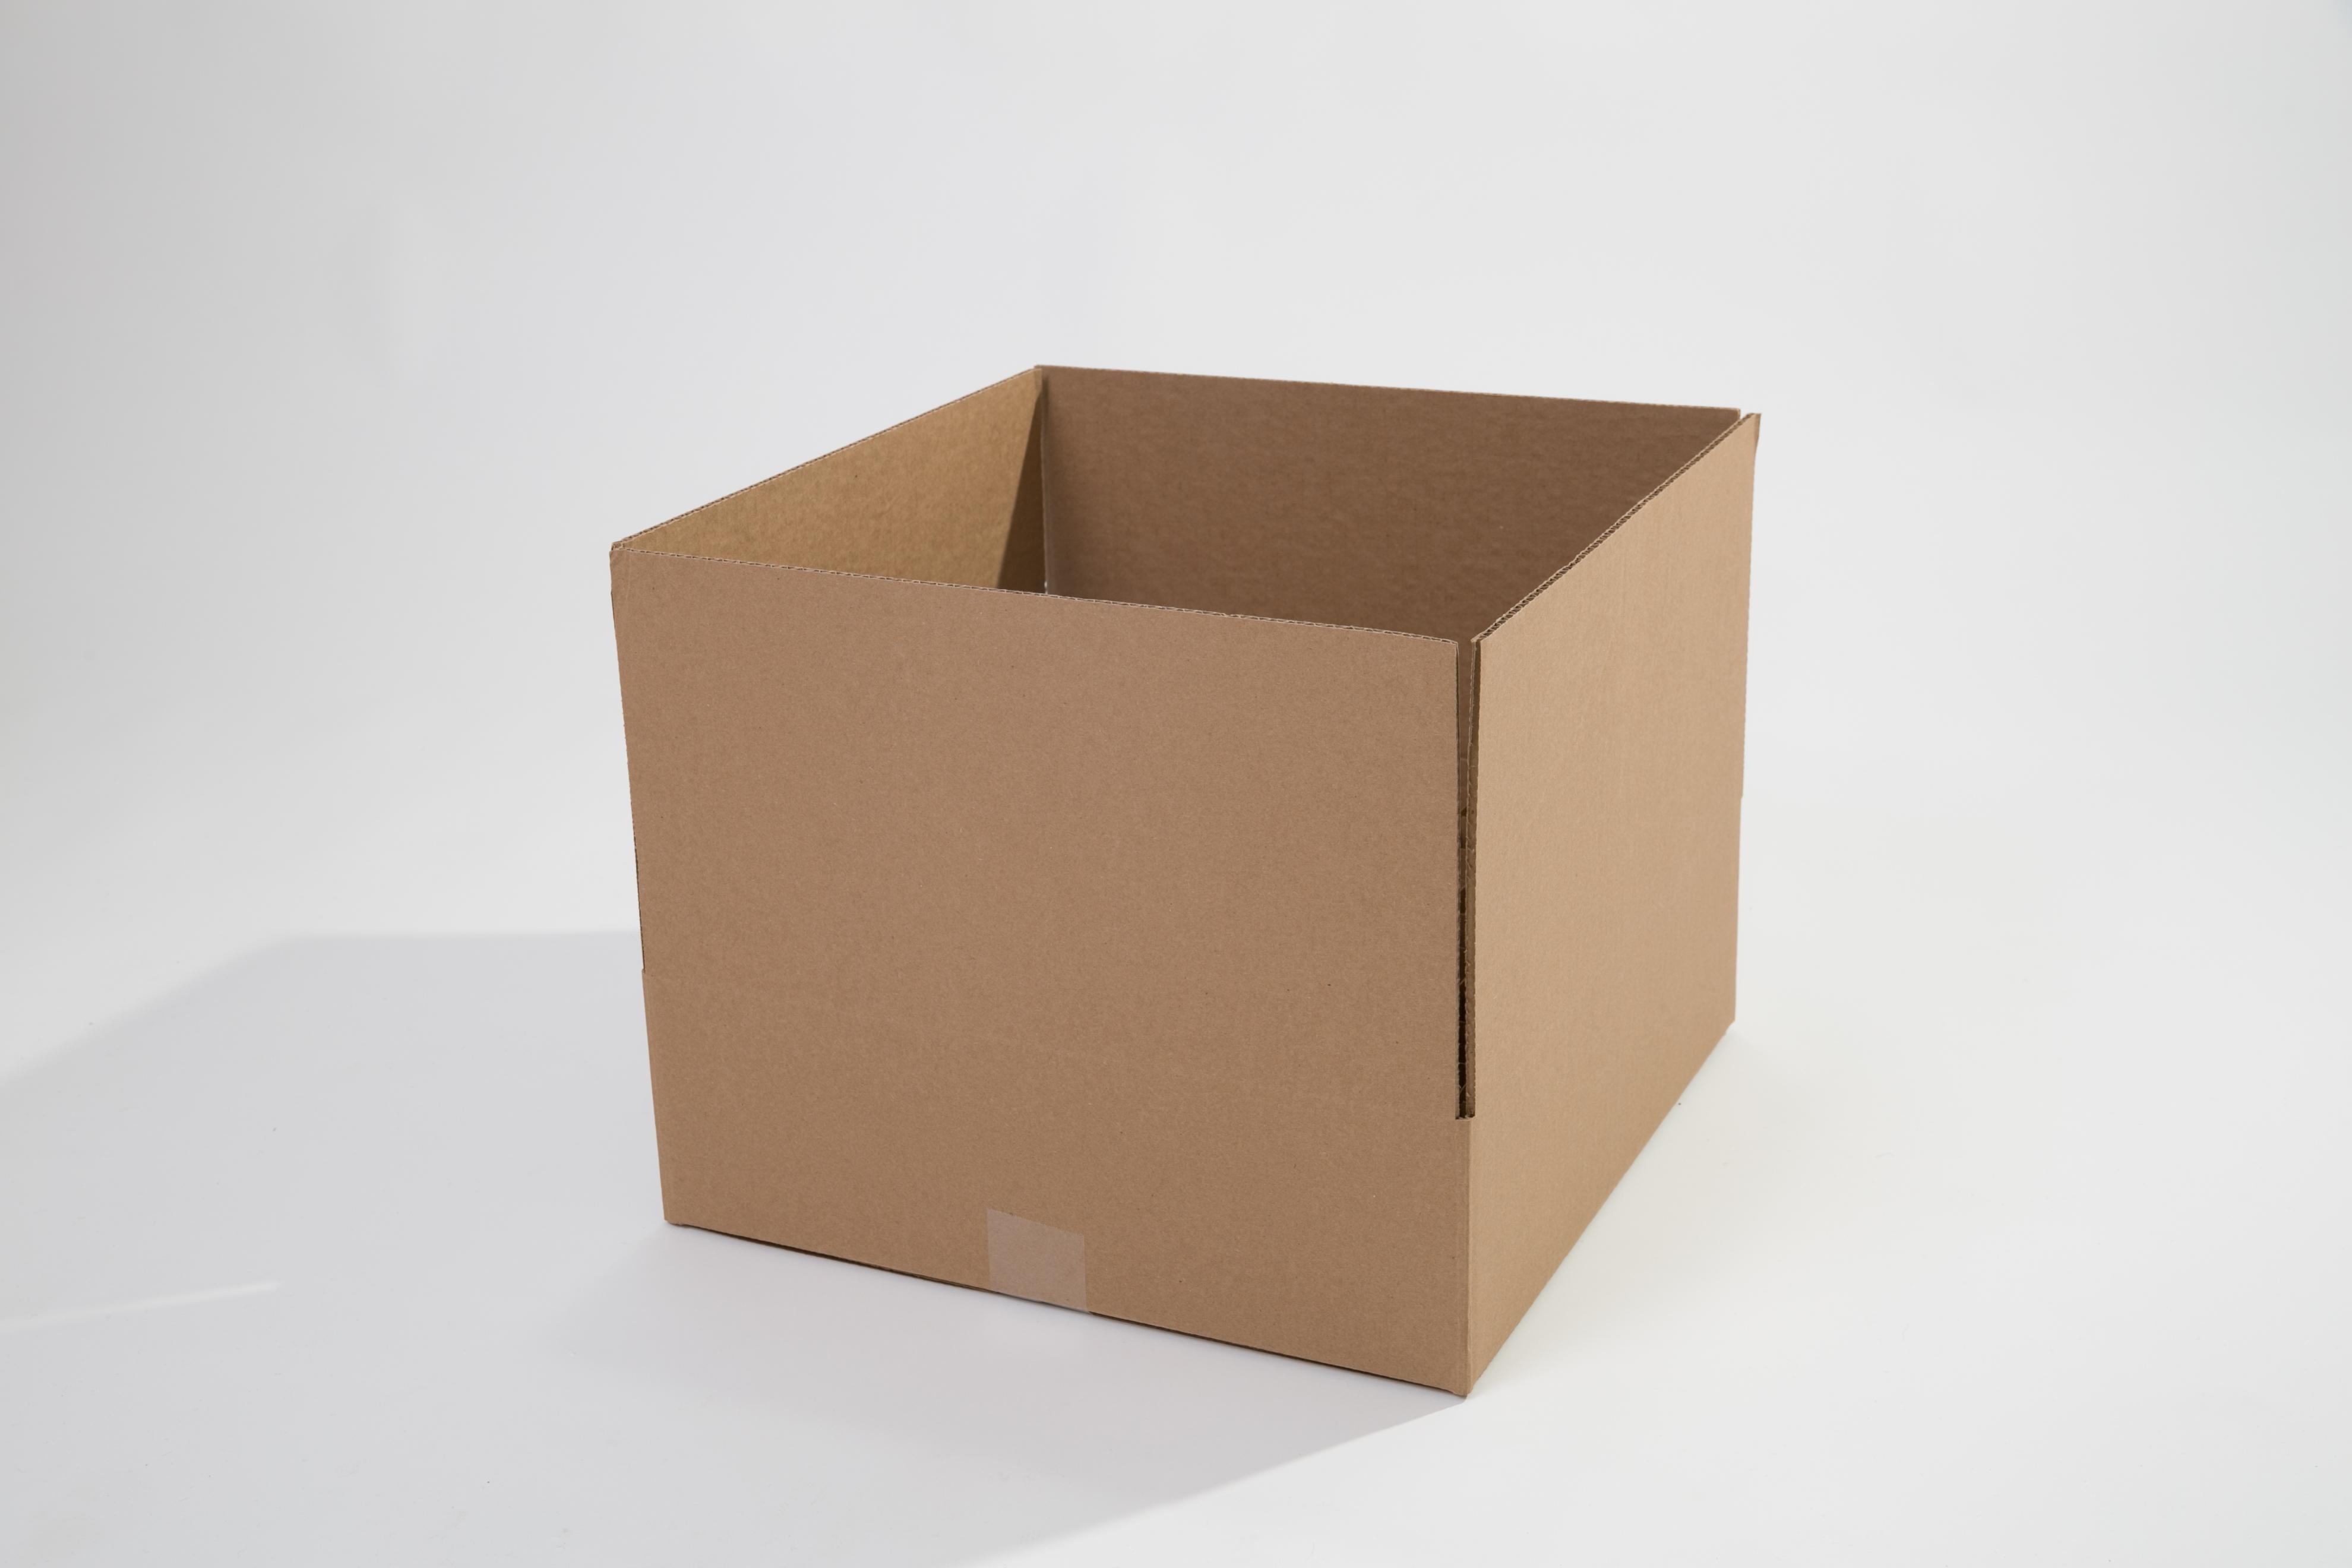 100 Count Box